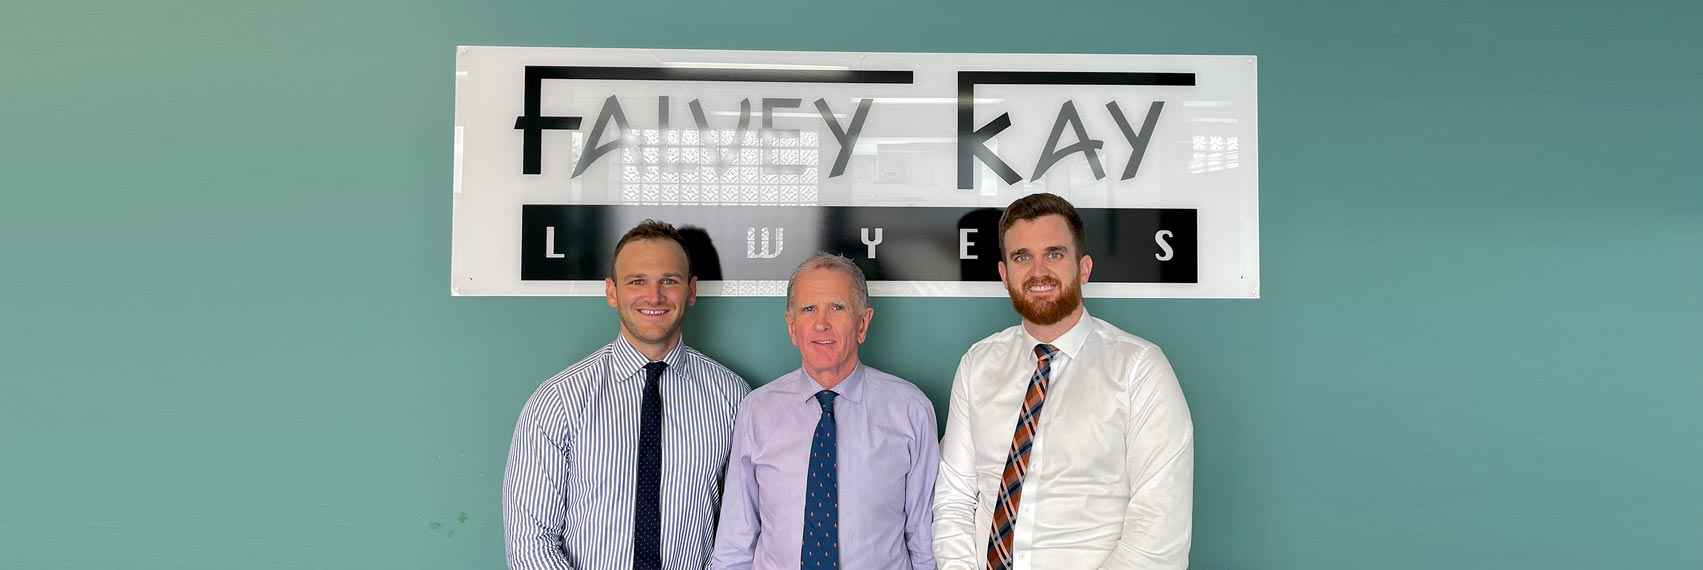 Team Photo of Falvey Kay Lawyers, Port Macquarie